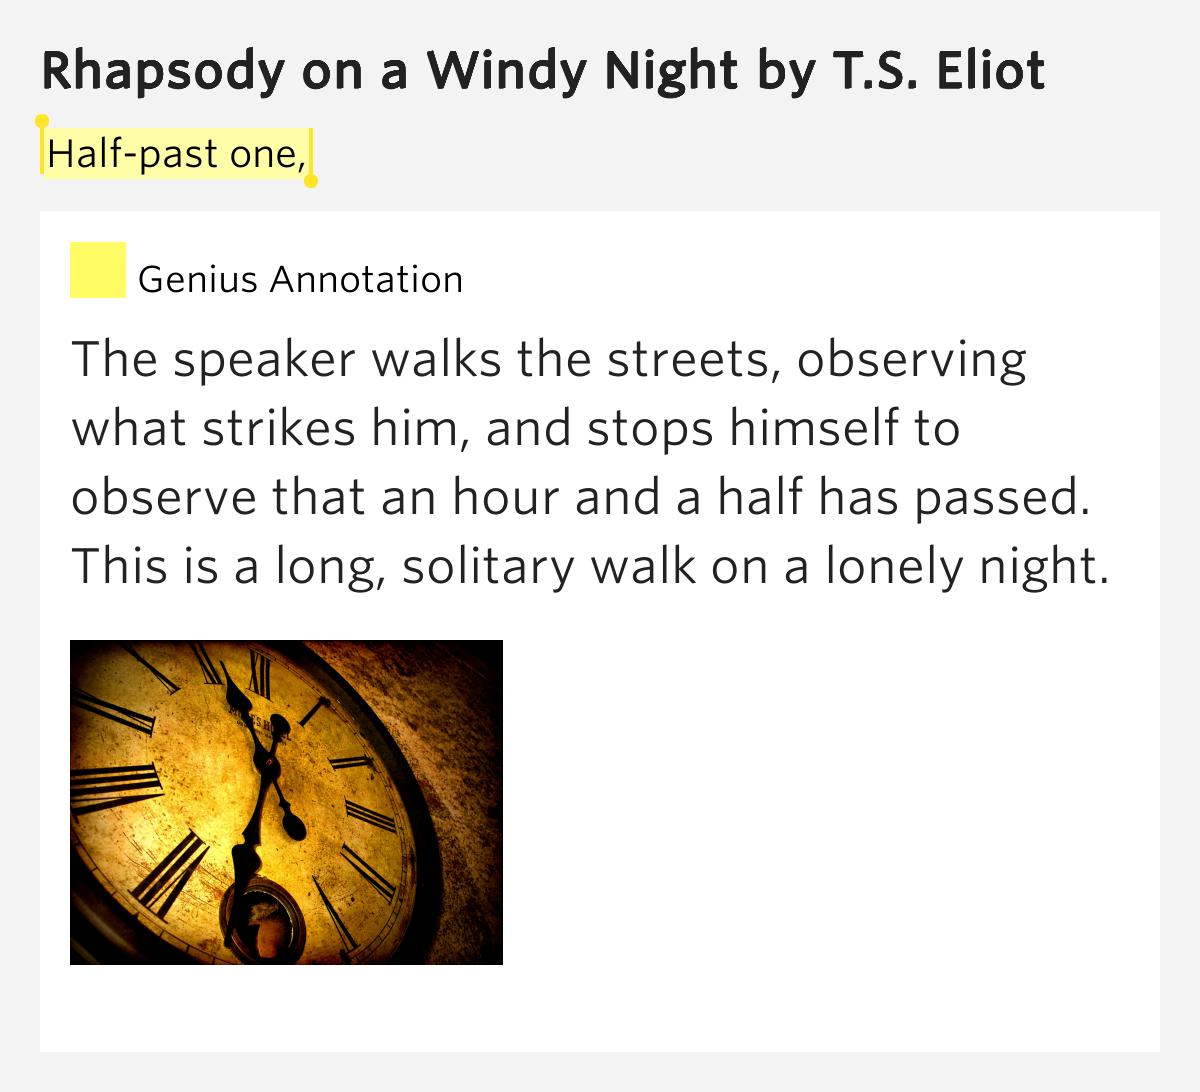 critical assessment ts eliot s poem rhapsody windy night